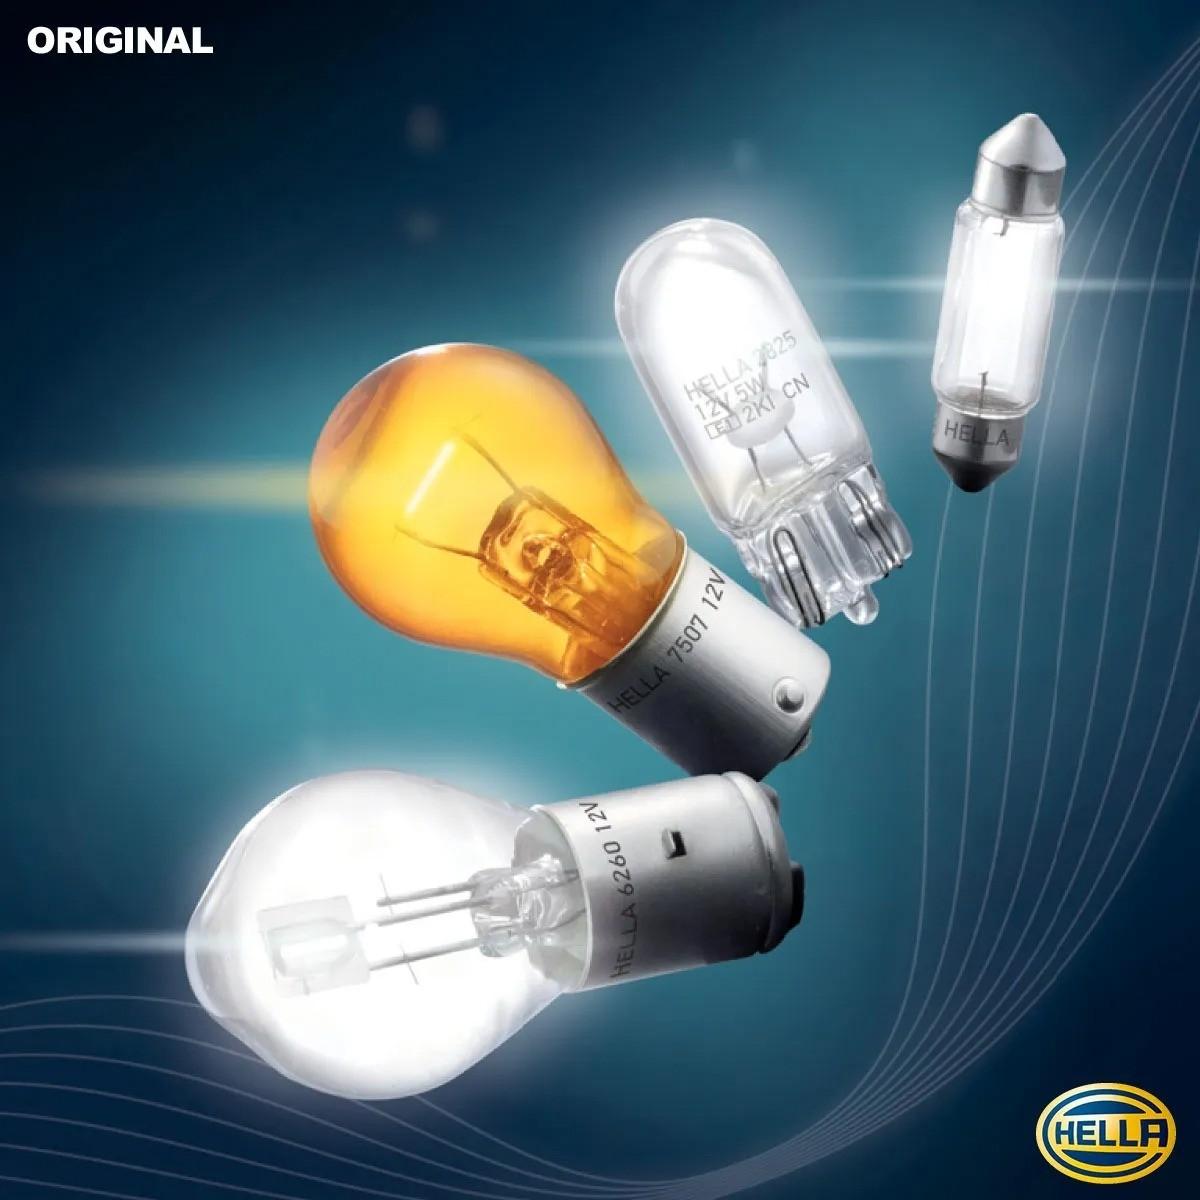 LAMPADA CONVENCIONAL 12V 65/55W FAROL HB5 UNIVERSAL HELLA